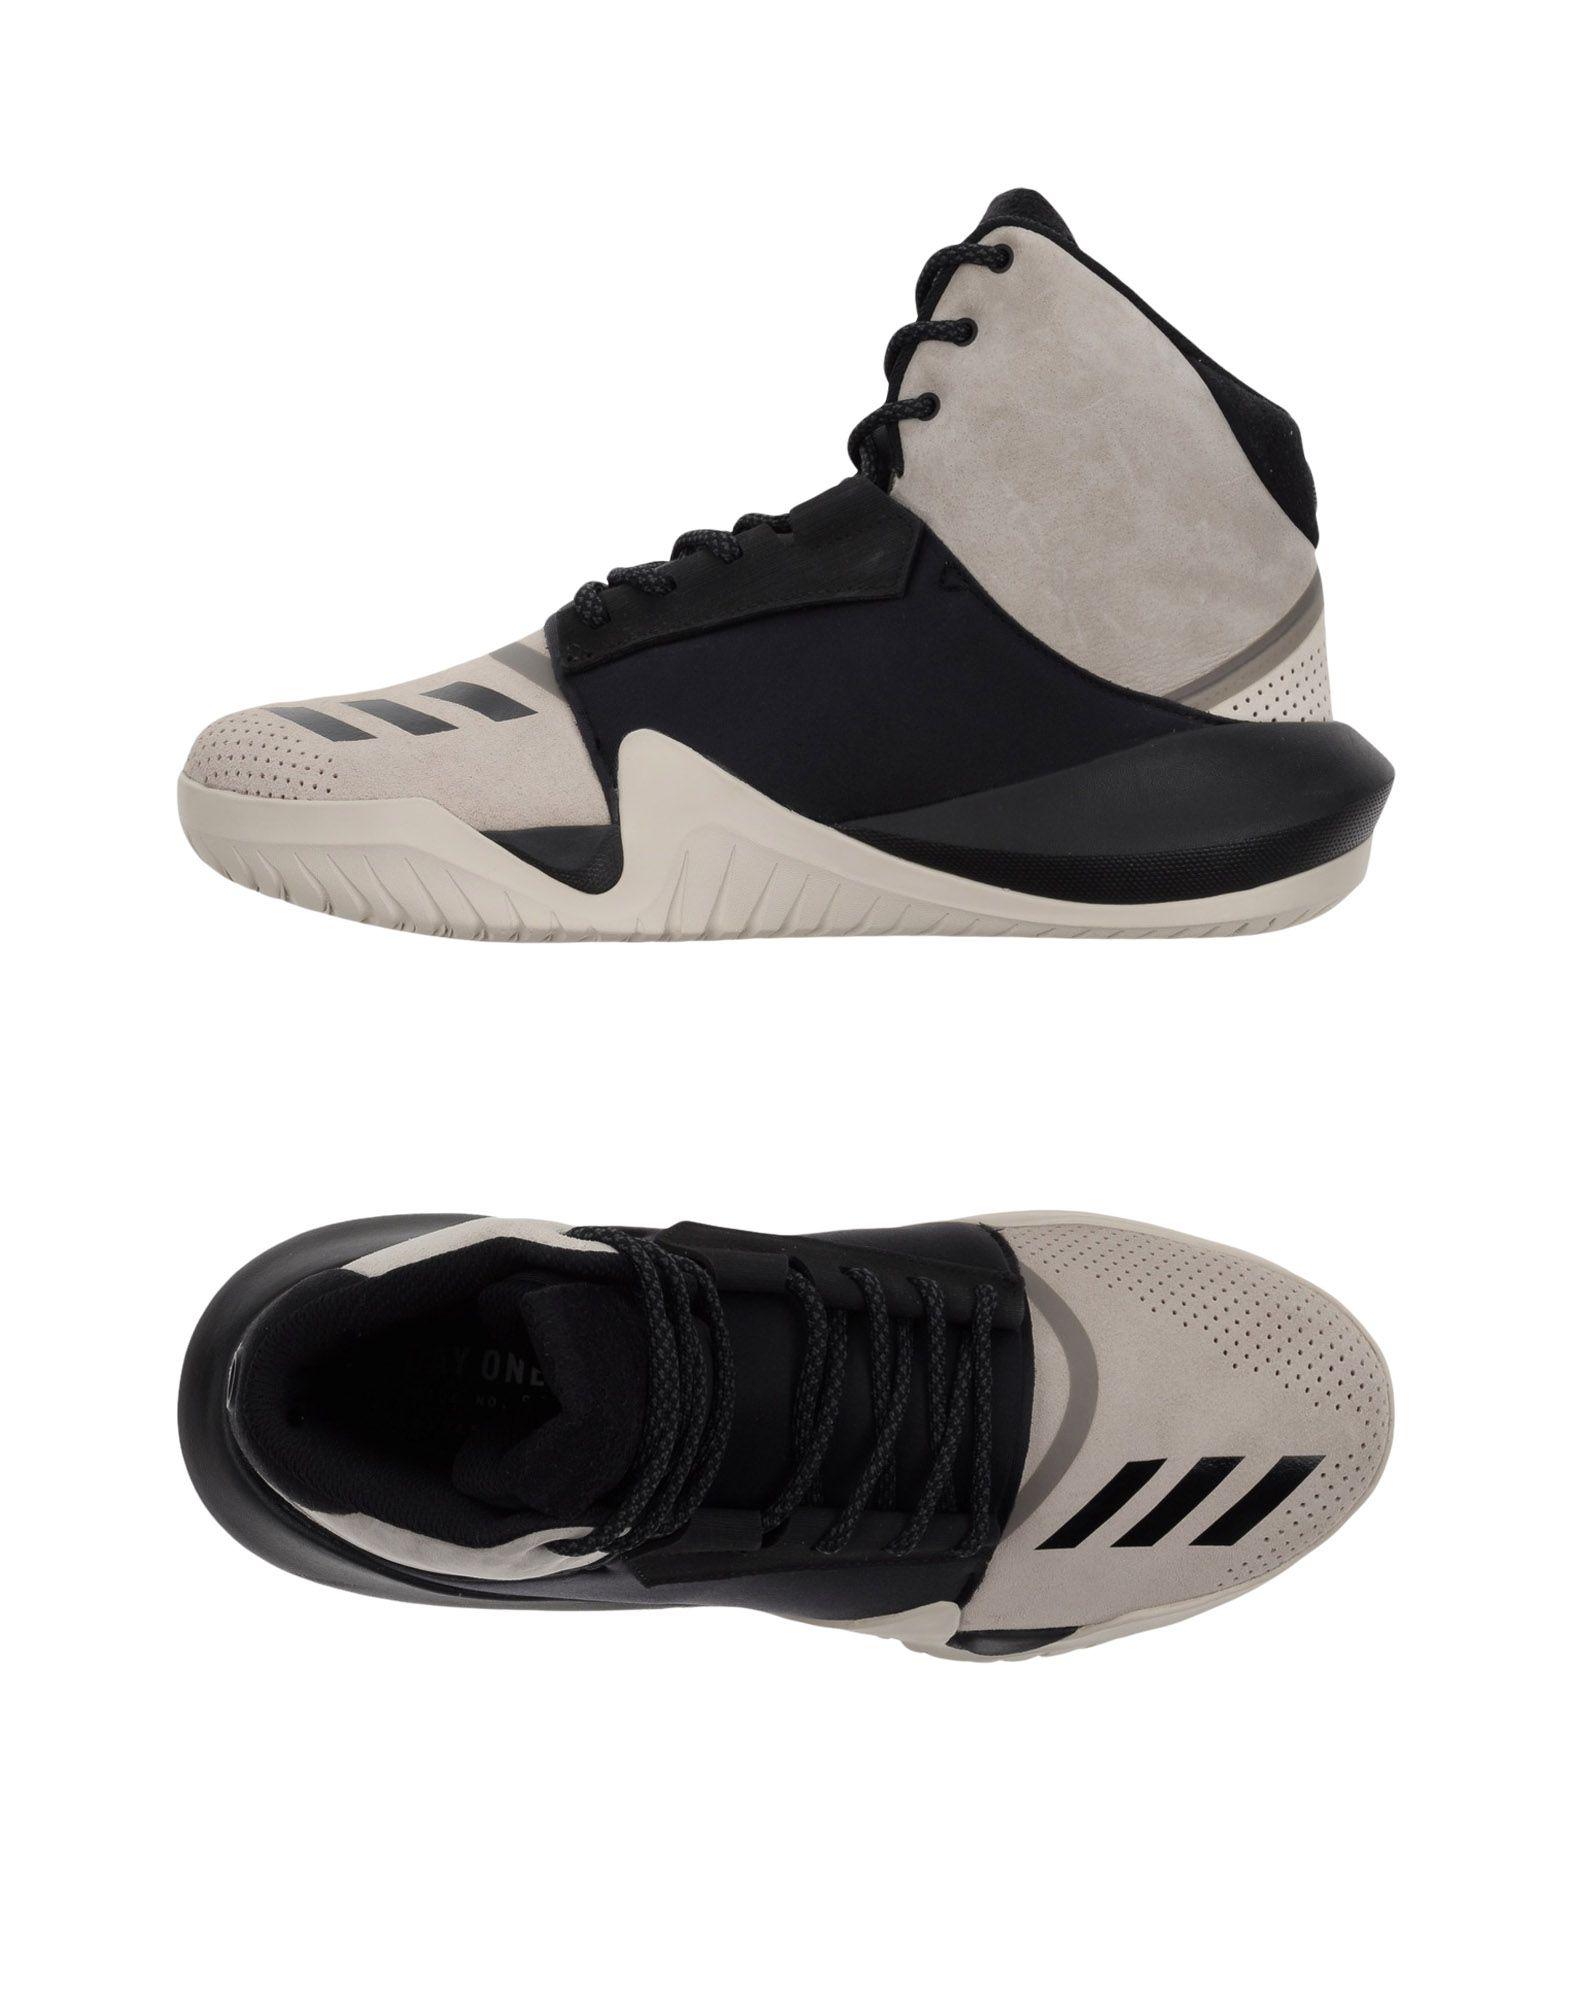 Adidas Sneakers - Men  Adidas Sneakers online on  Men Canada - 11360493WN faf836